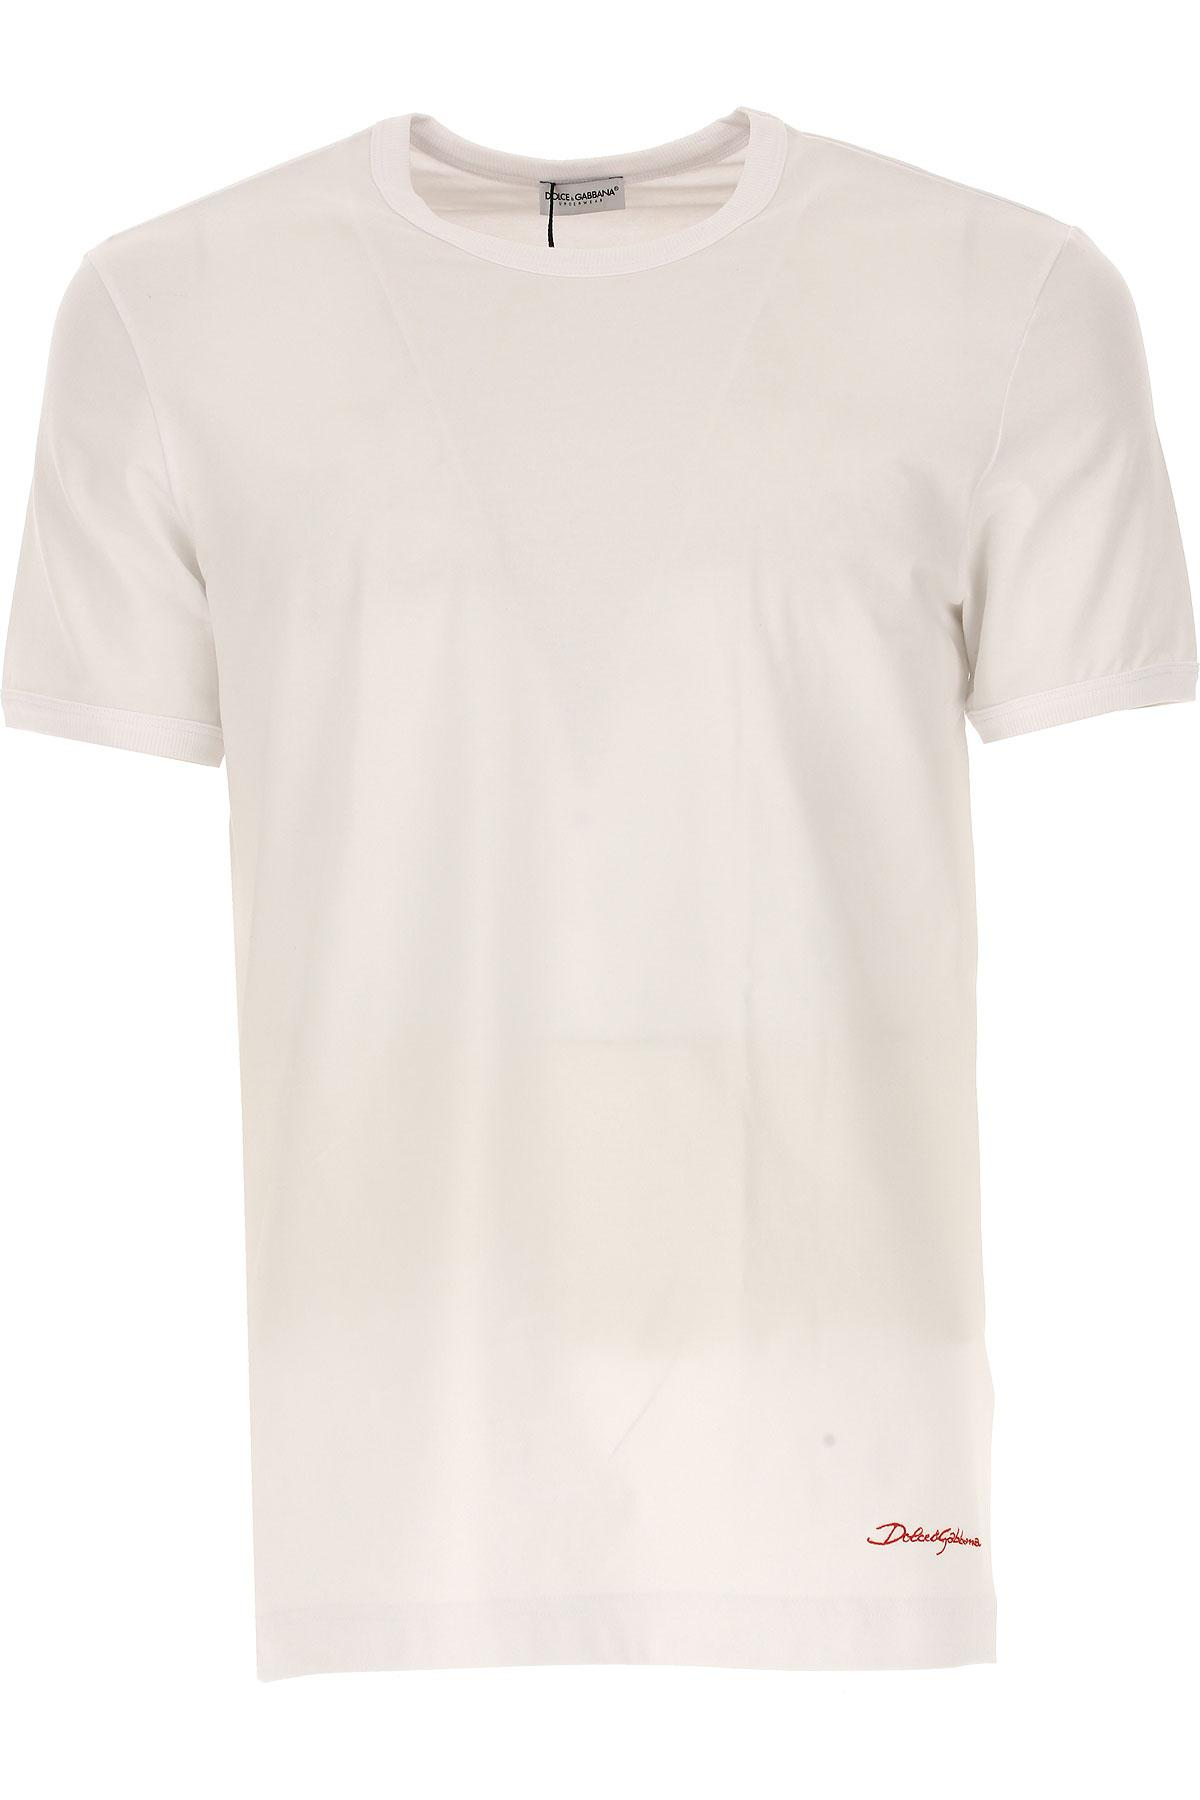 ... Absorbant la Transpiration Coton Marque Soldes DG-1206 tee shirt dolce  gabbana homme pas cher 669c2bf57b93